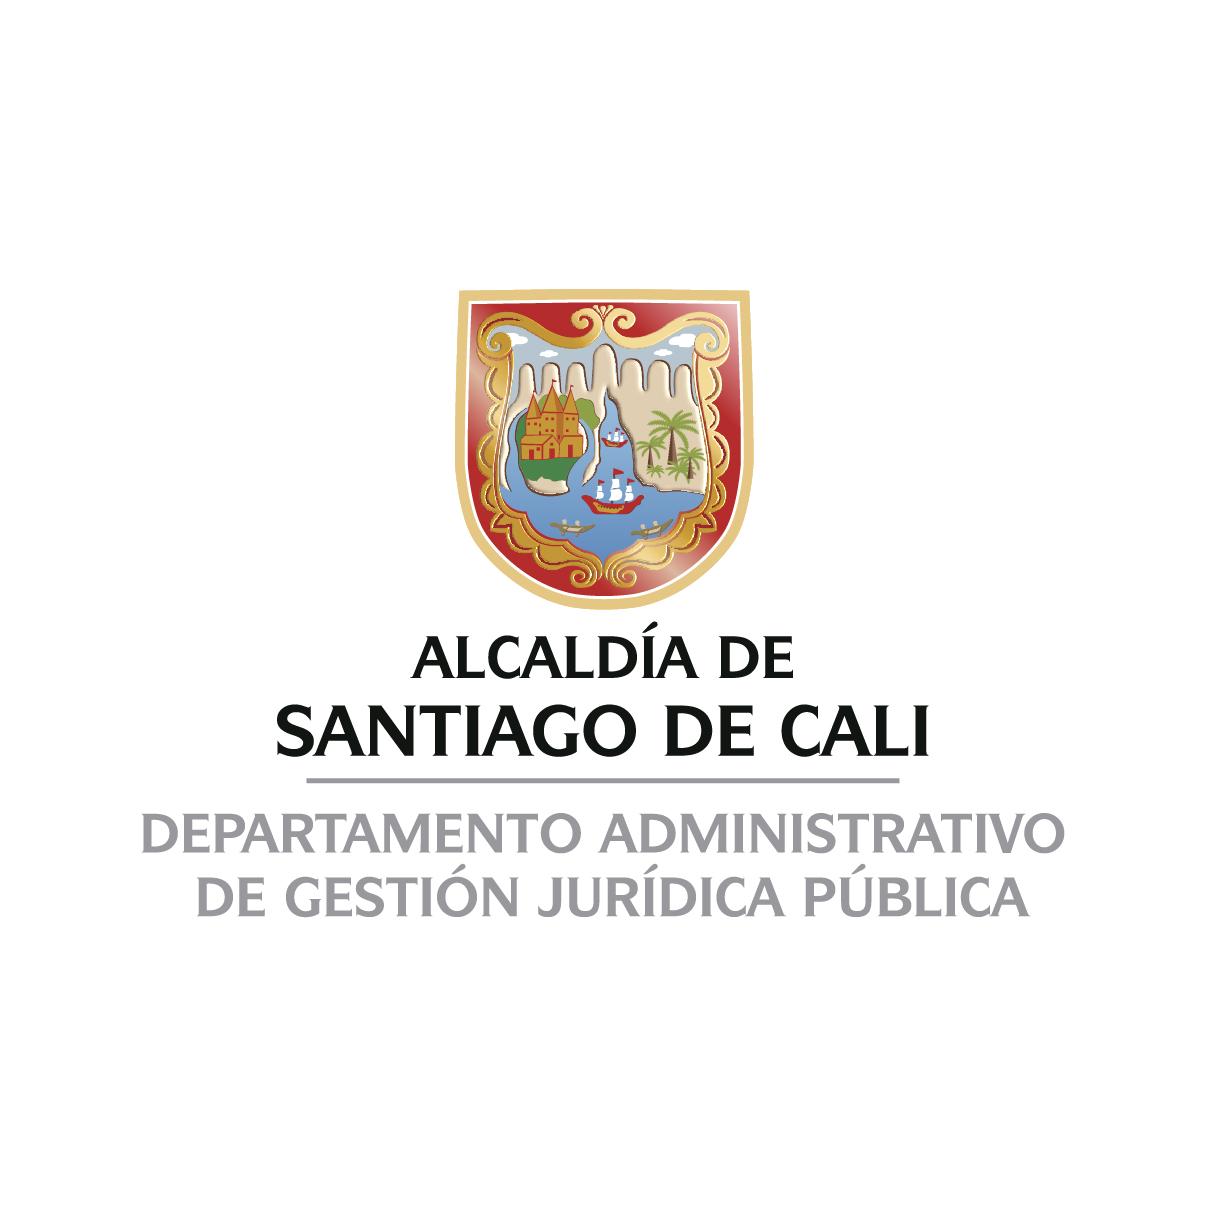 departamento-administrativo-de-gestion-juridica-publica